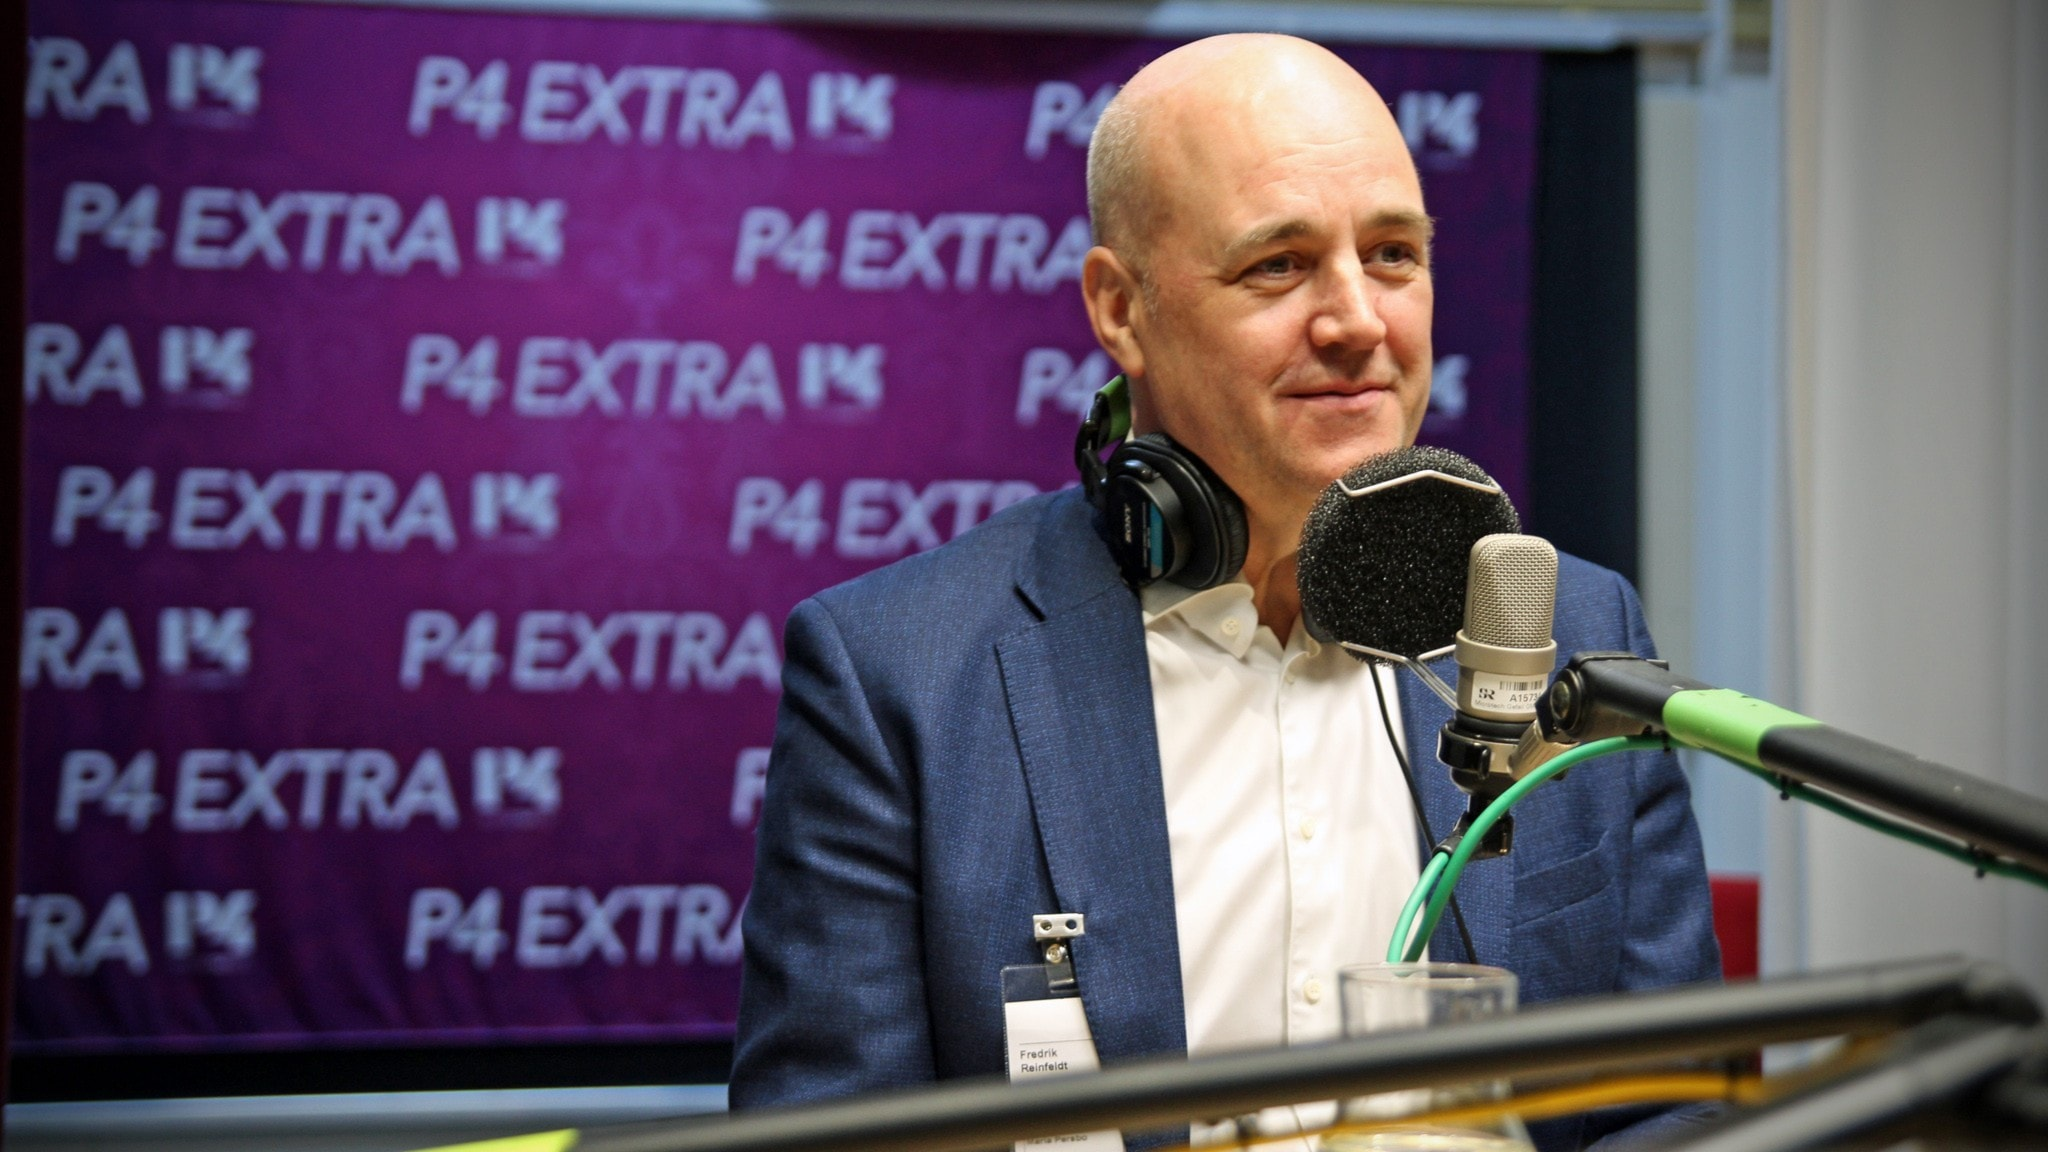 Fredrik Reinfeldt: